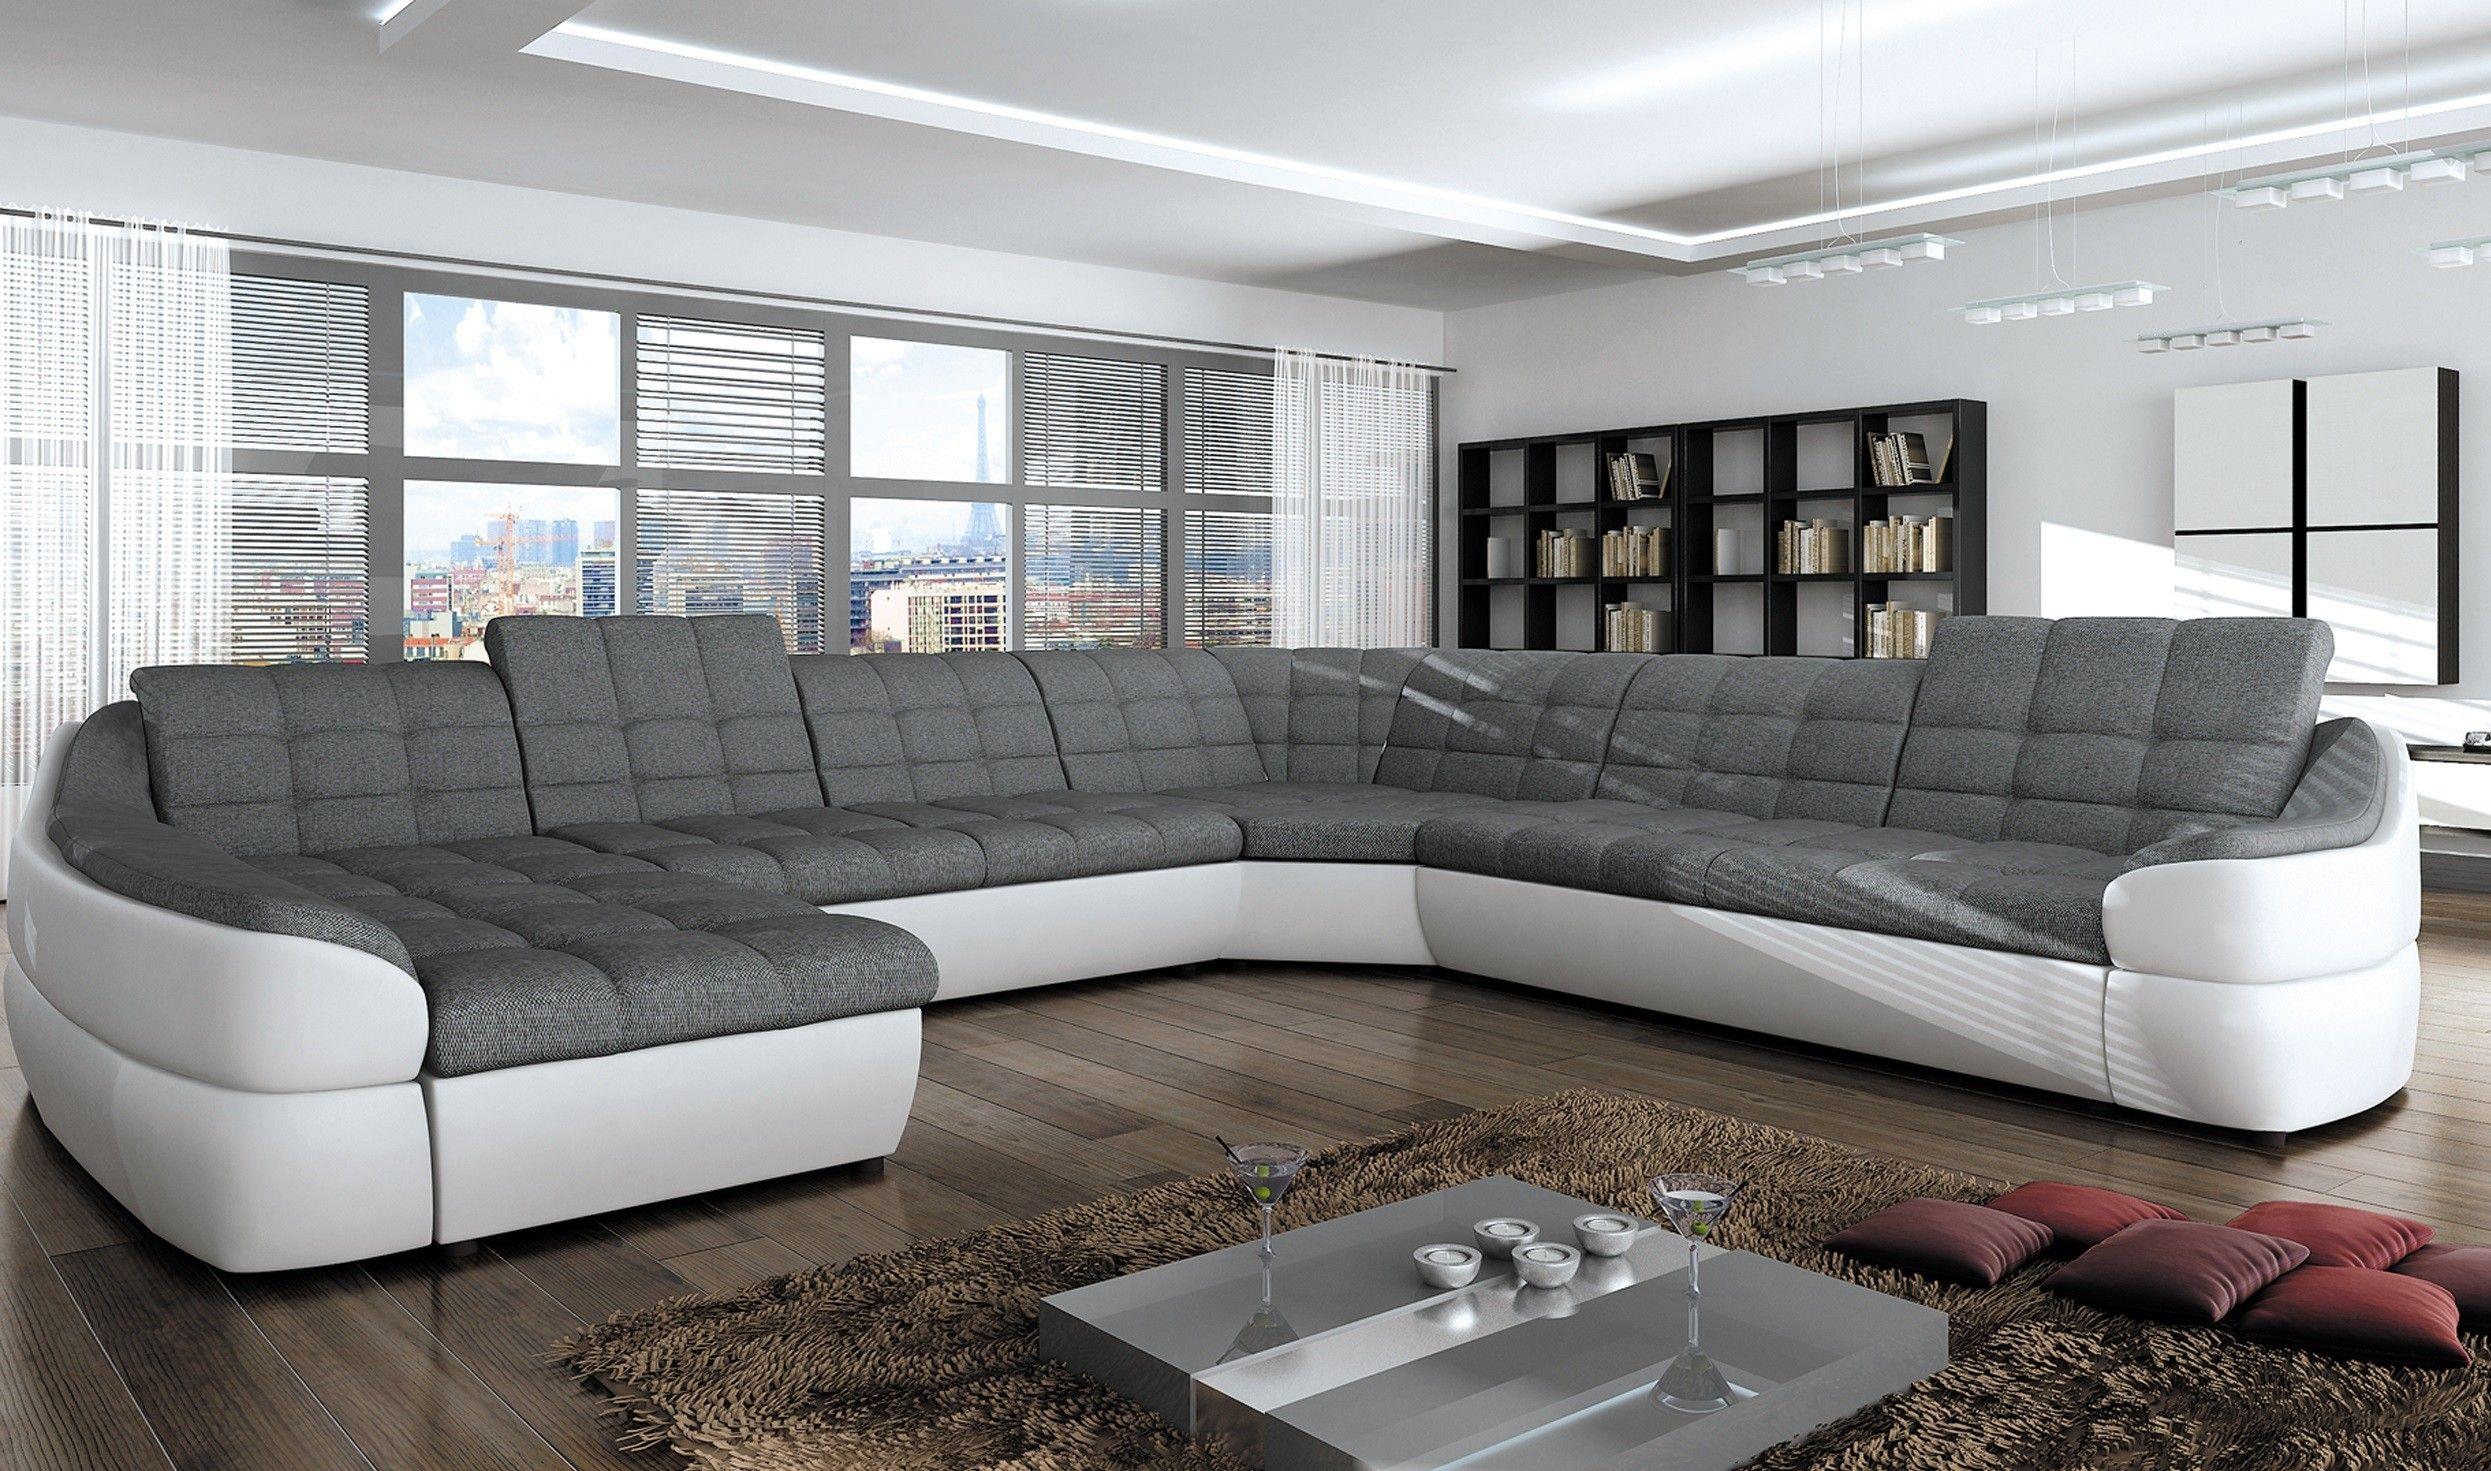 u shaped corner sofa sectional sofa couch